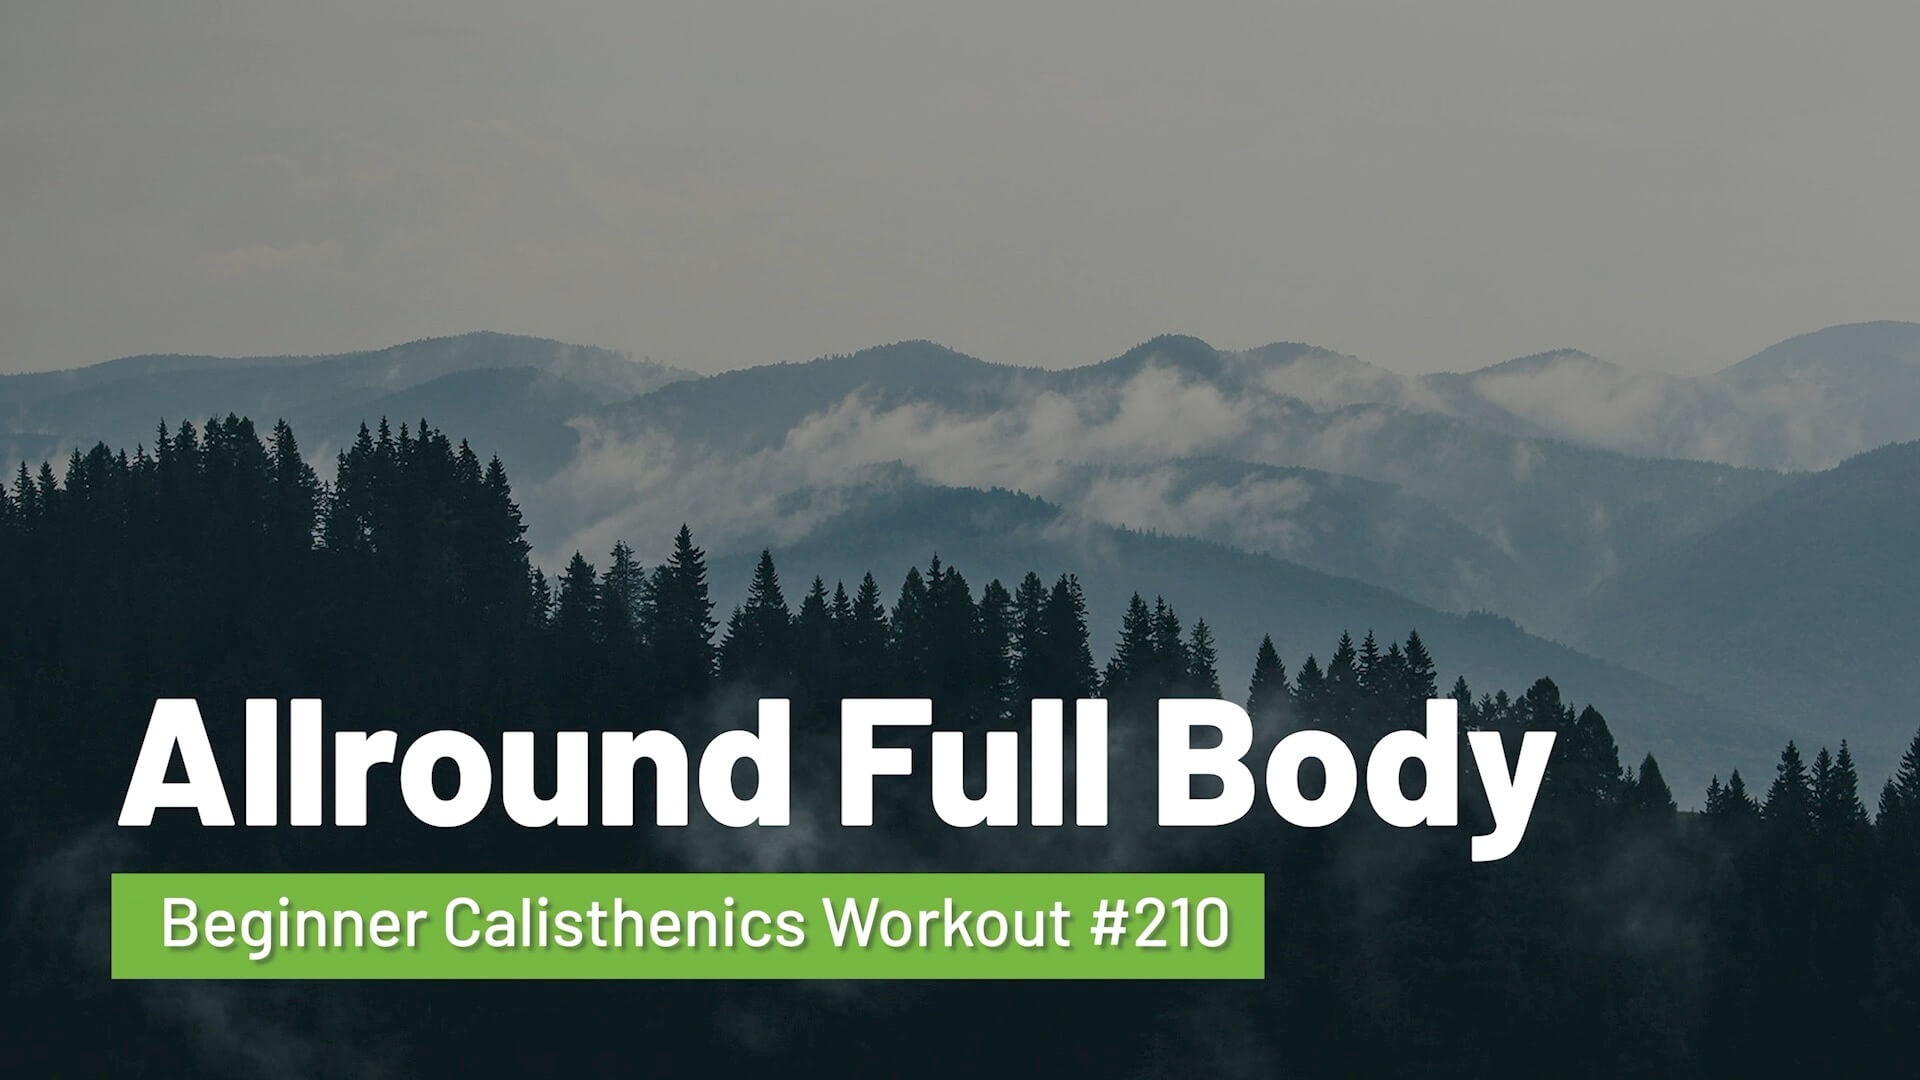 Workout #210